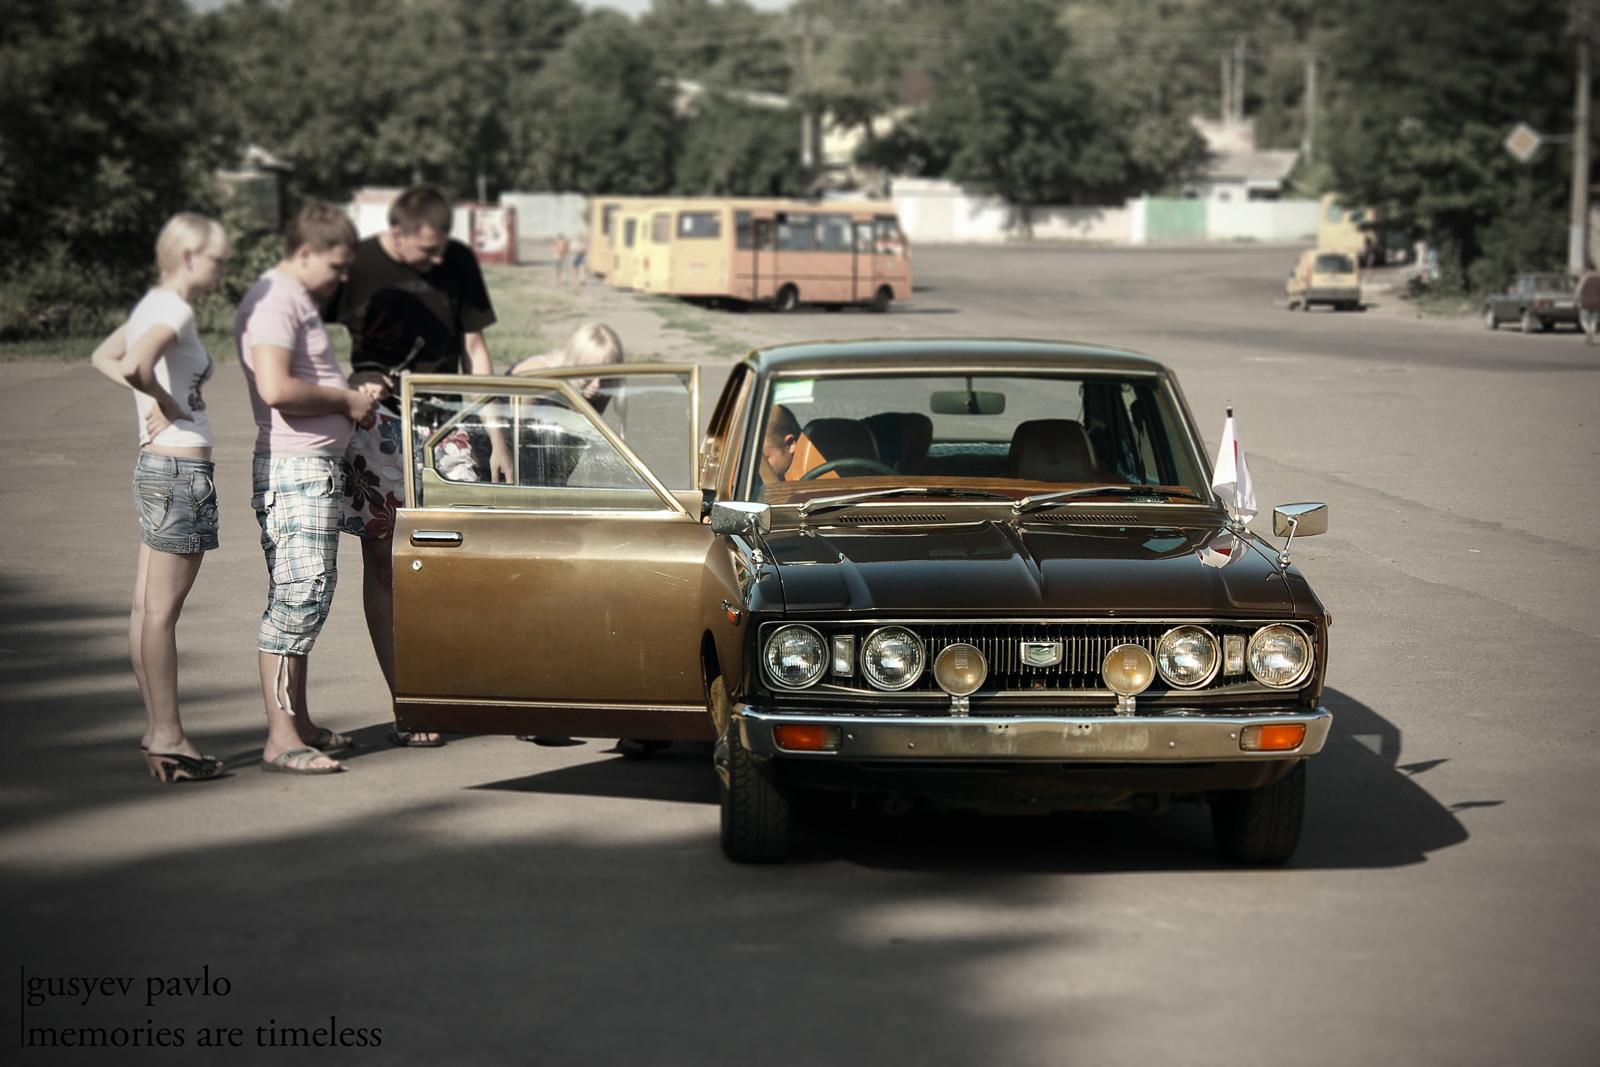 Toyota Carina TA-10 j-cars.in.ua Одесса Украина